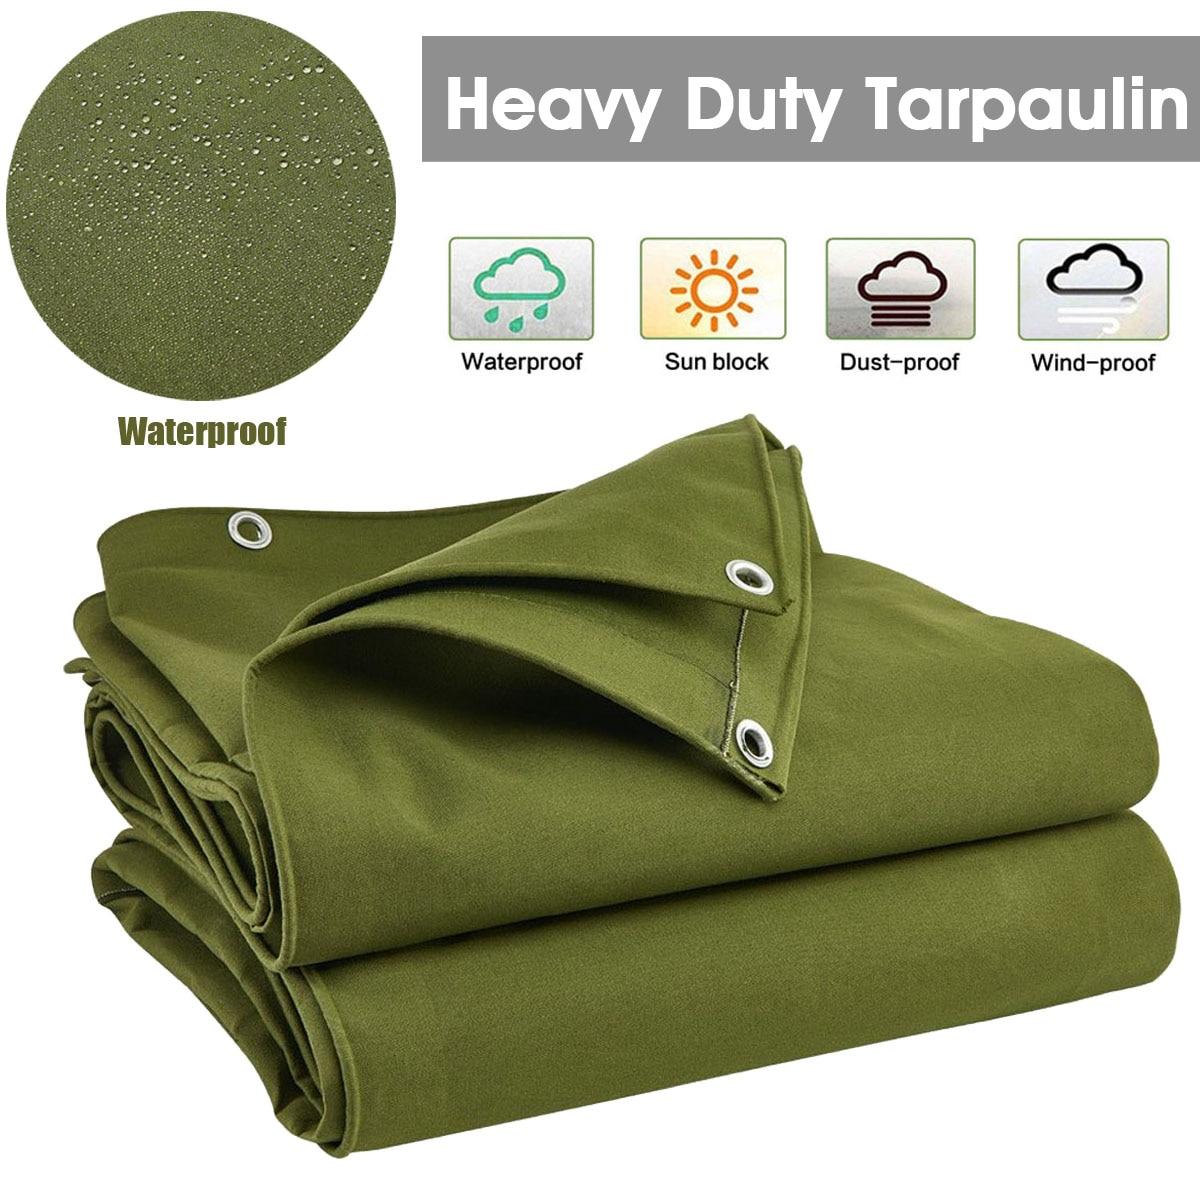 Large Heavy Duty Canvas Tarp Tarpaulin Sun Blocked Waterproof Dustproof Shelter Canvas Sunshade Cloth Canopy Tarp Garden Awning